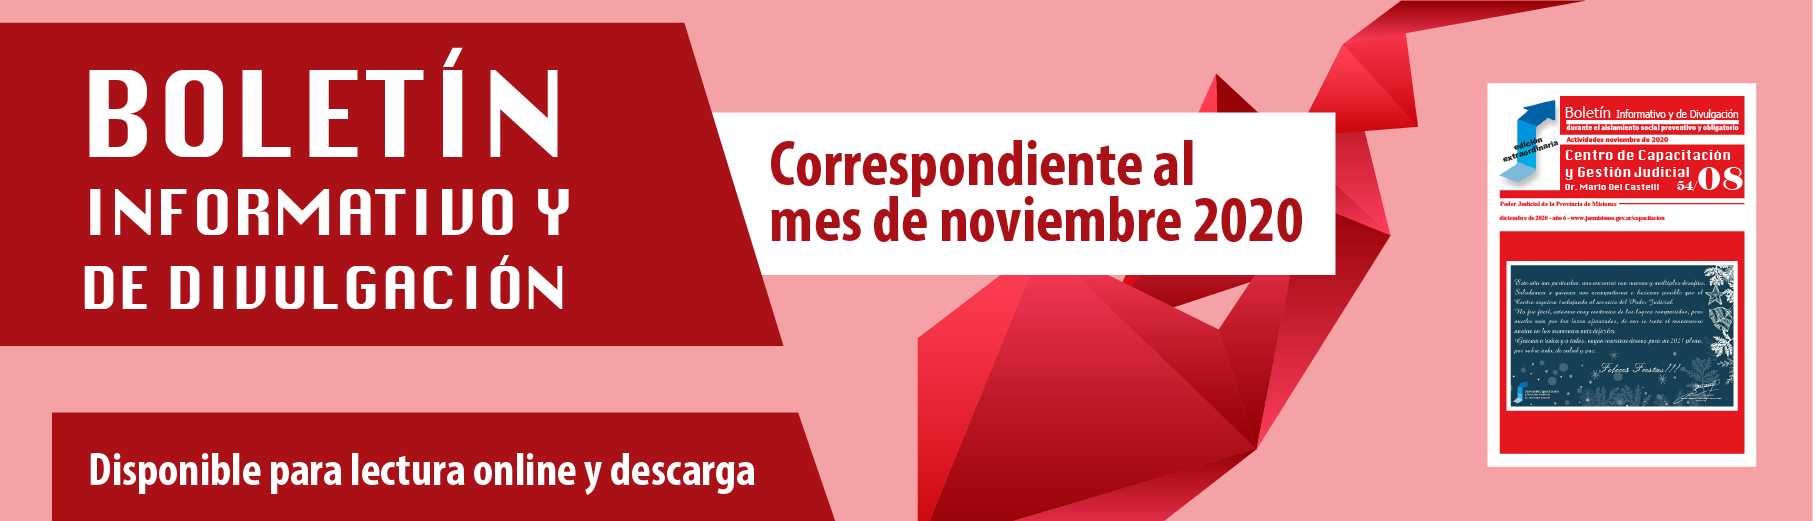 Boletín informativo noviembre